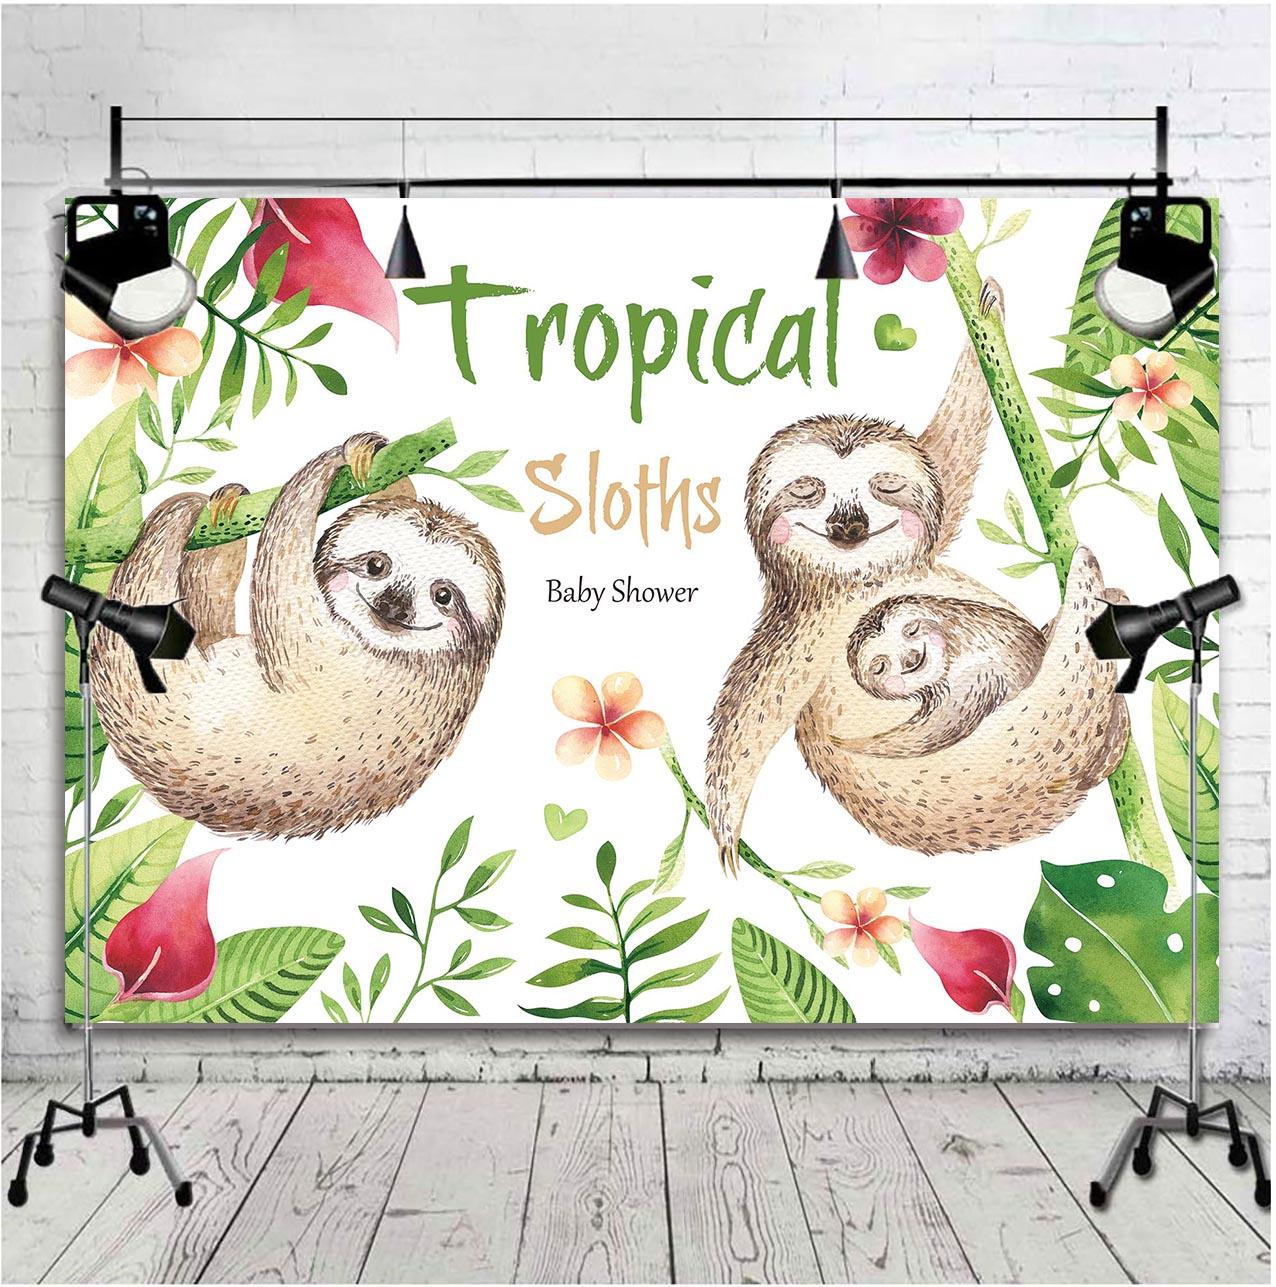 Tropical Sloth Family Birthday Invitation Theme Backdrop Sleepy Sloths Baby Shower Party Decoration Photography Background